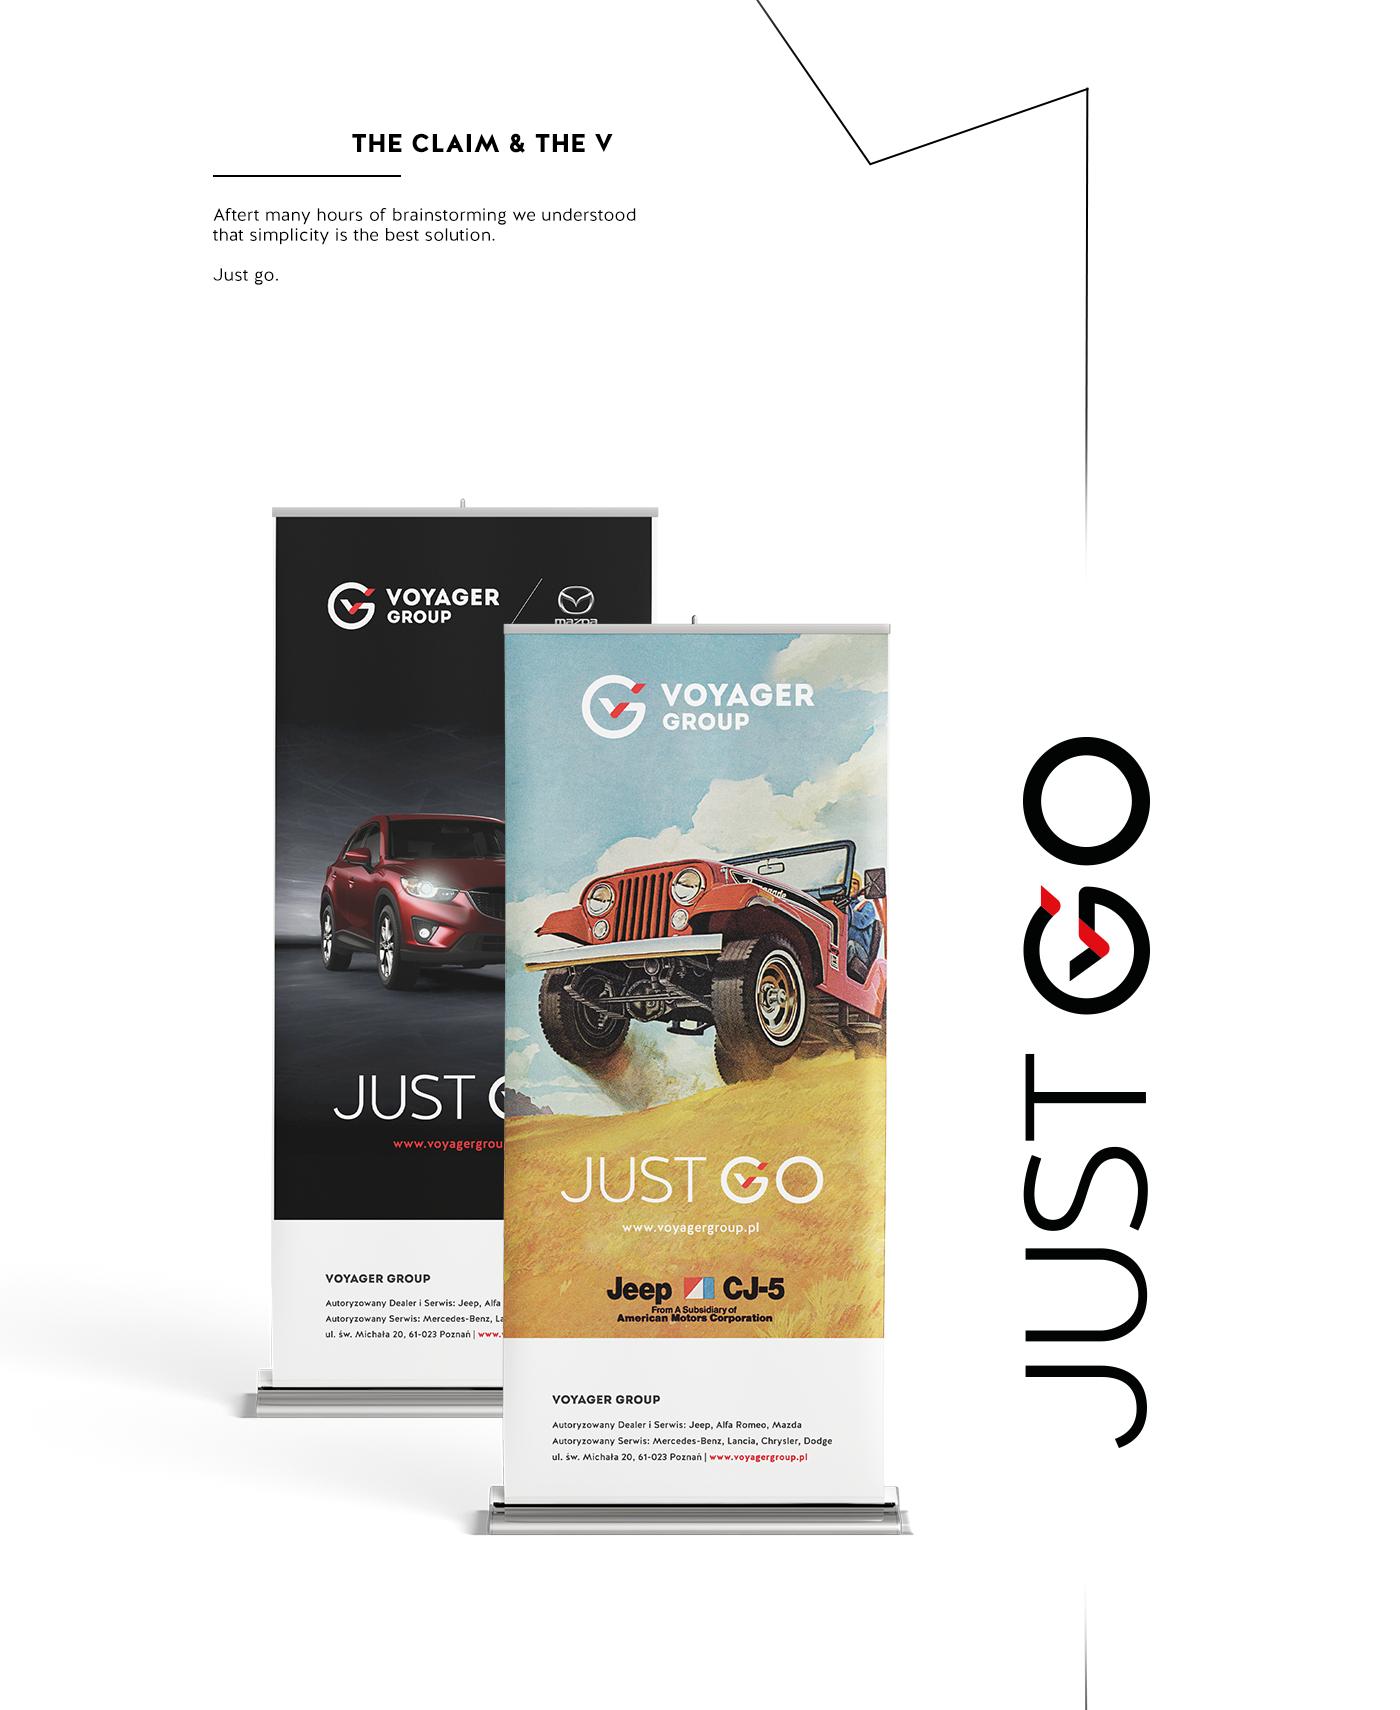 car dealer jeep mazda poznan branding  poznań branding samochody logo CI